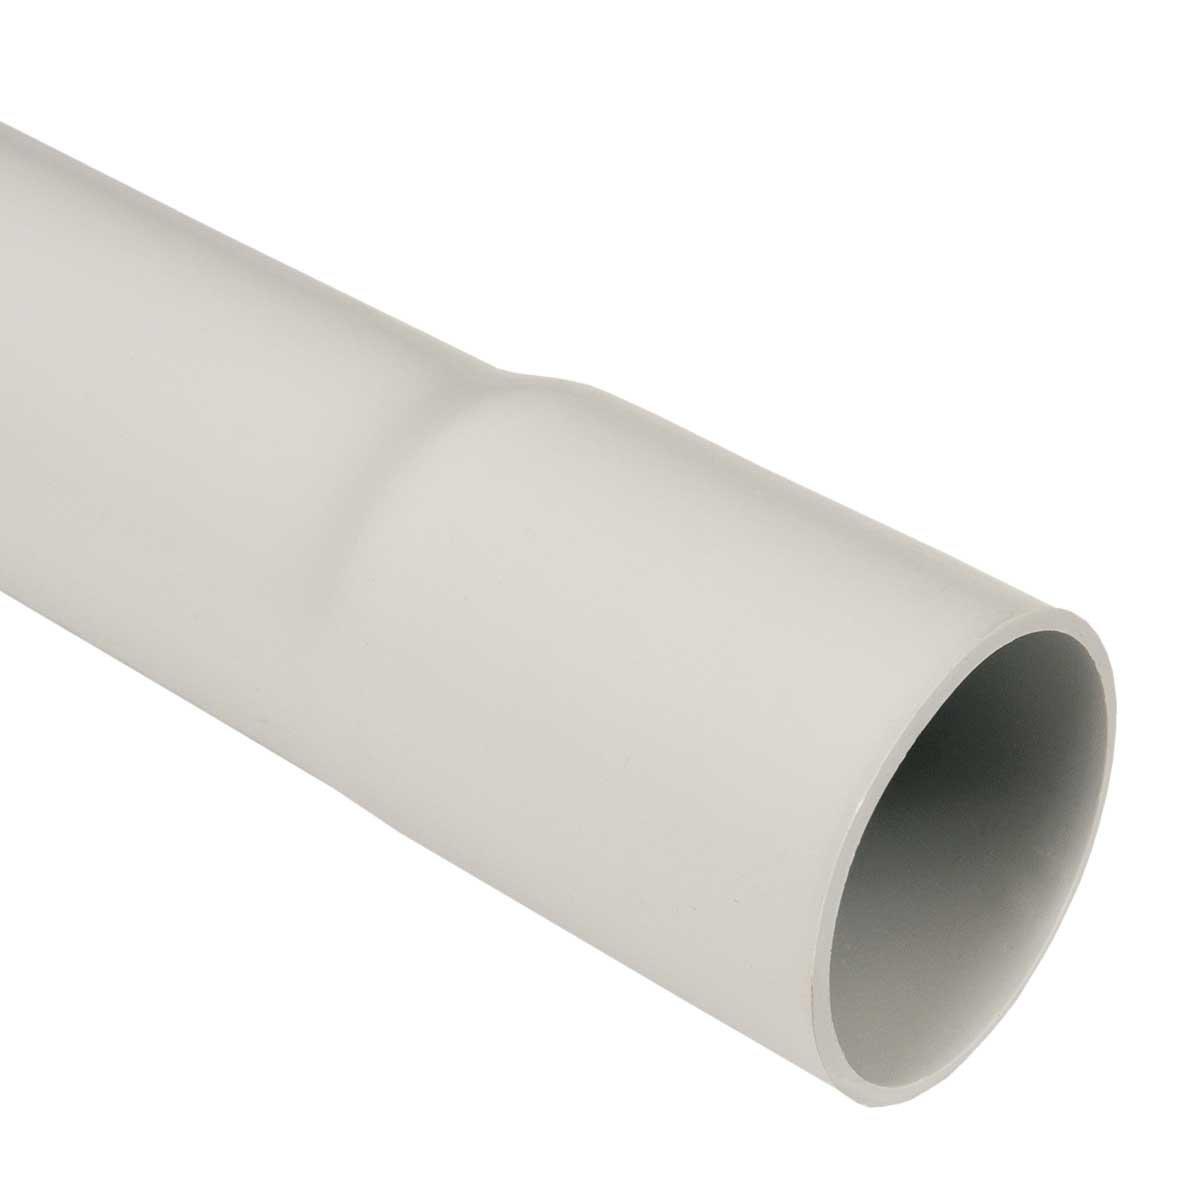 Leerrohr M32 Elektrokabel-Rohr 20m 32mm gemufft hellgrau PVC